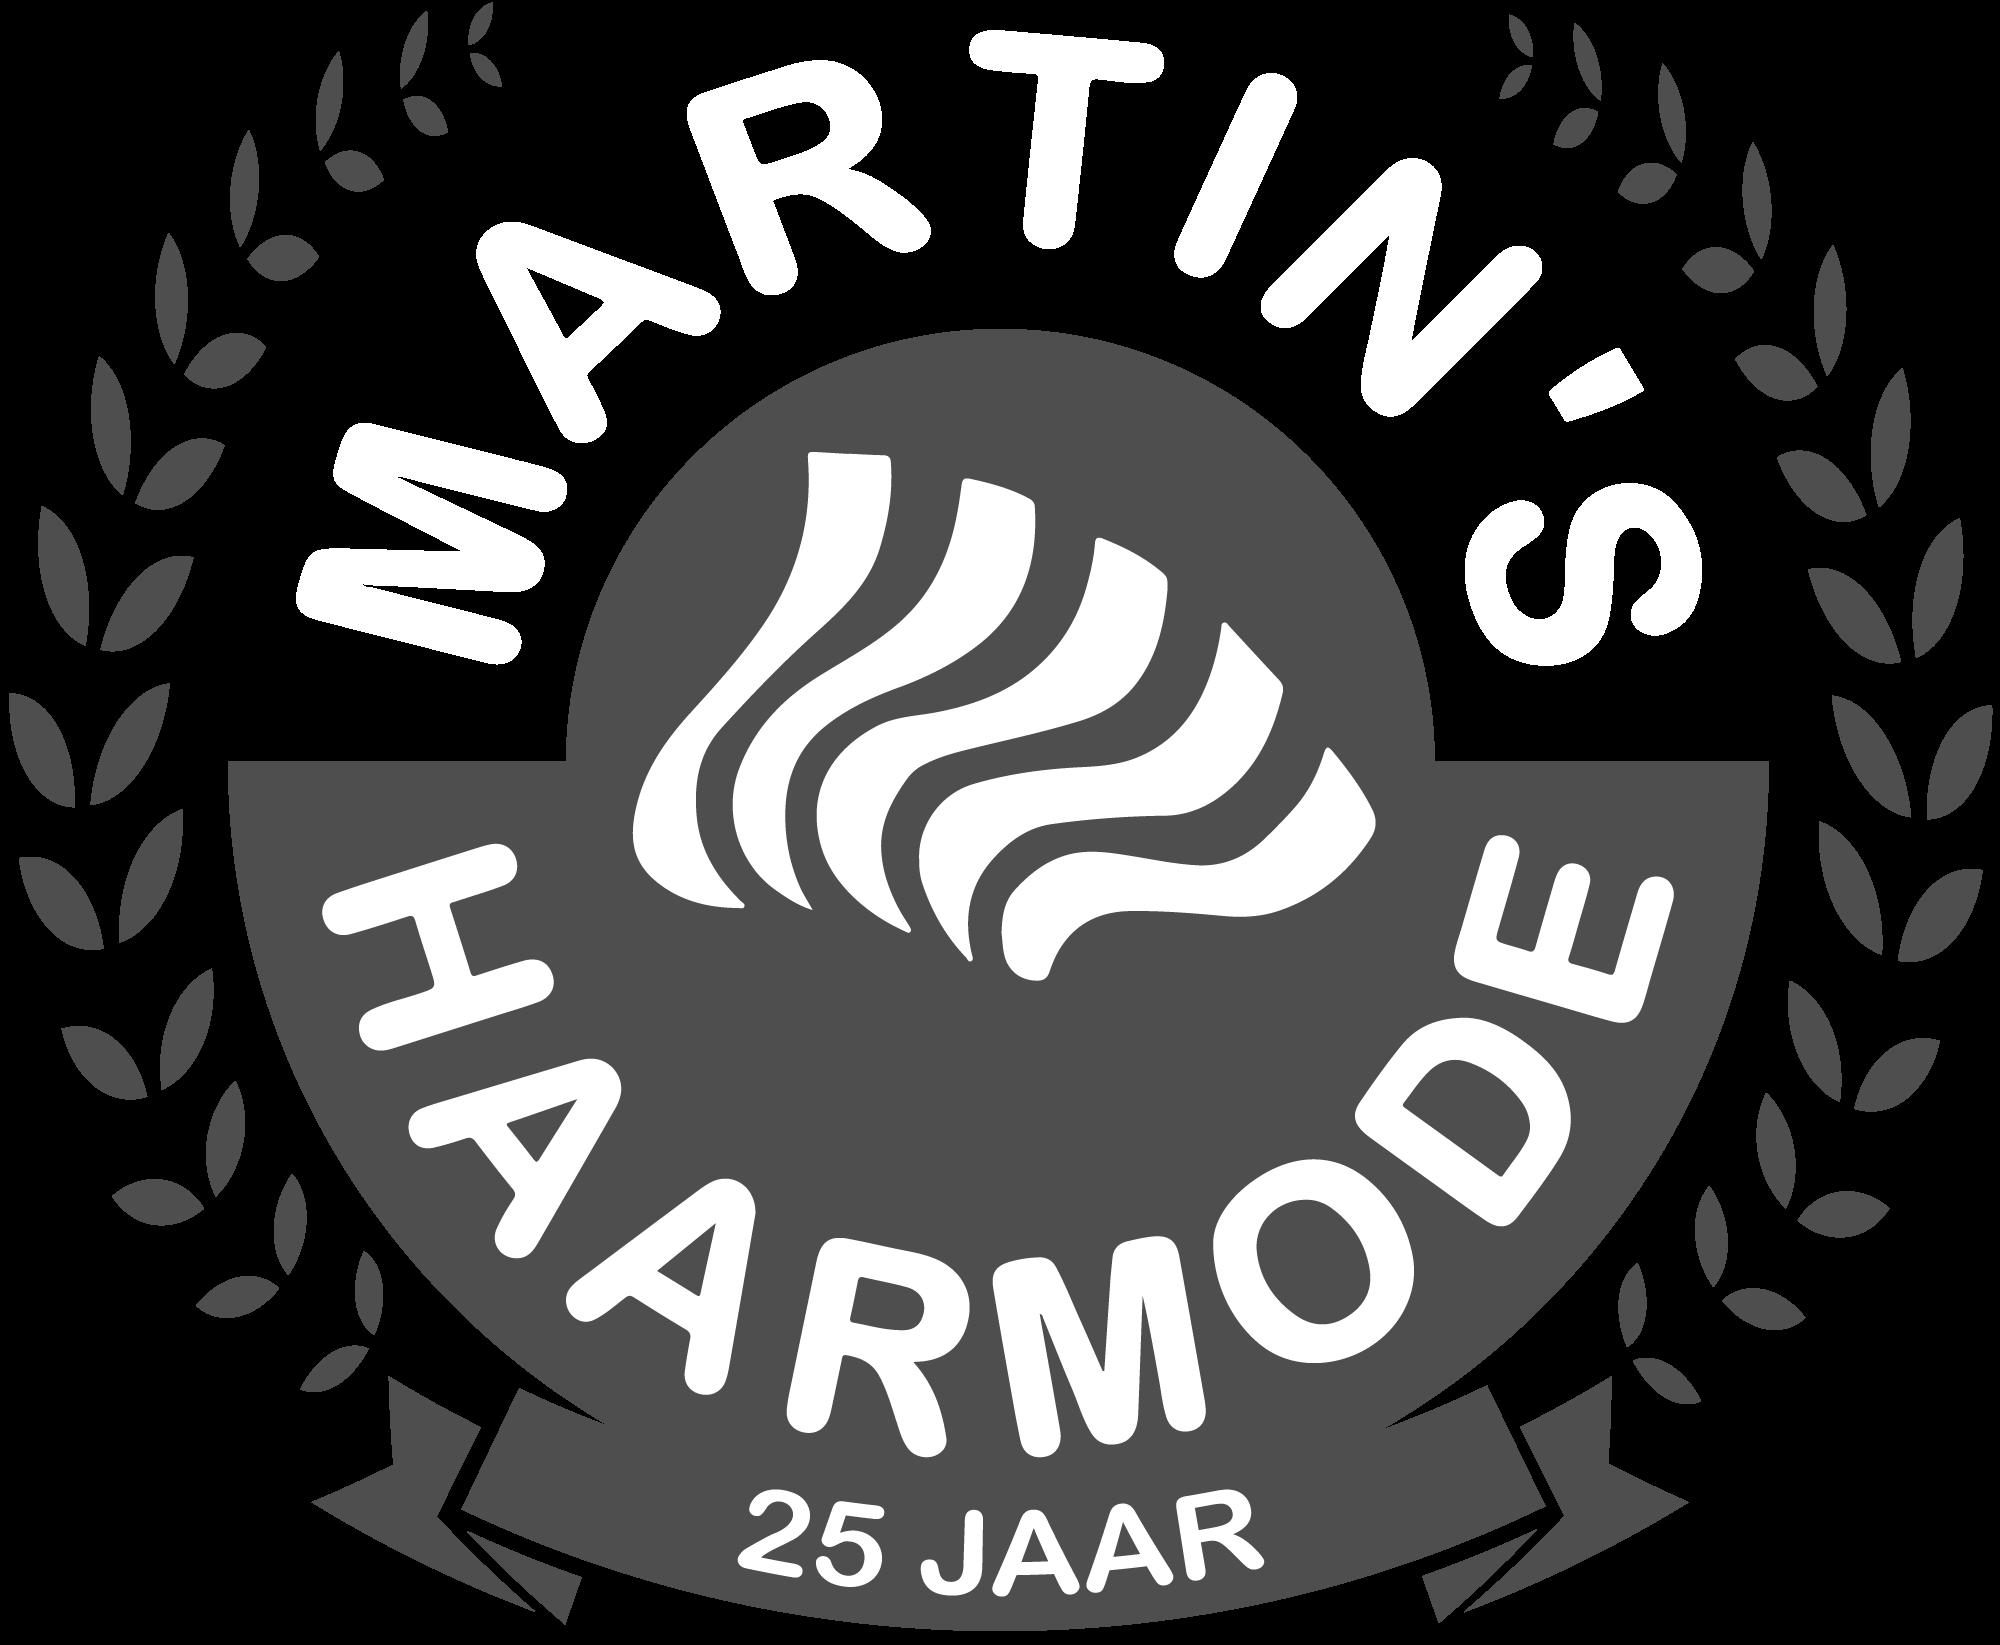 Martin's Haarmode